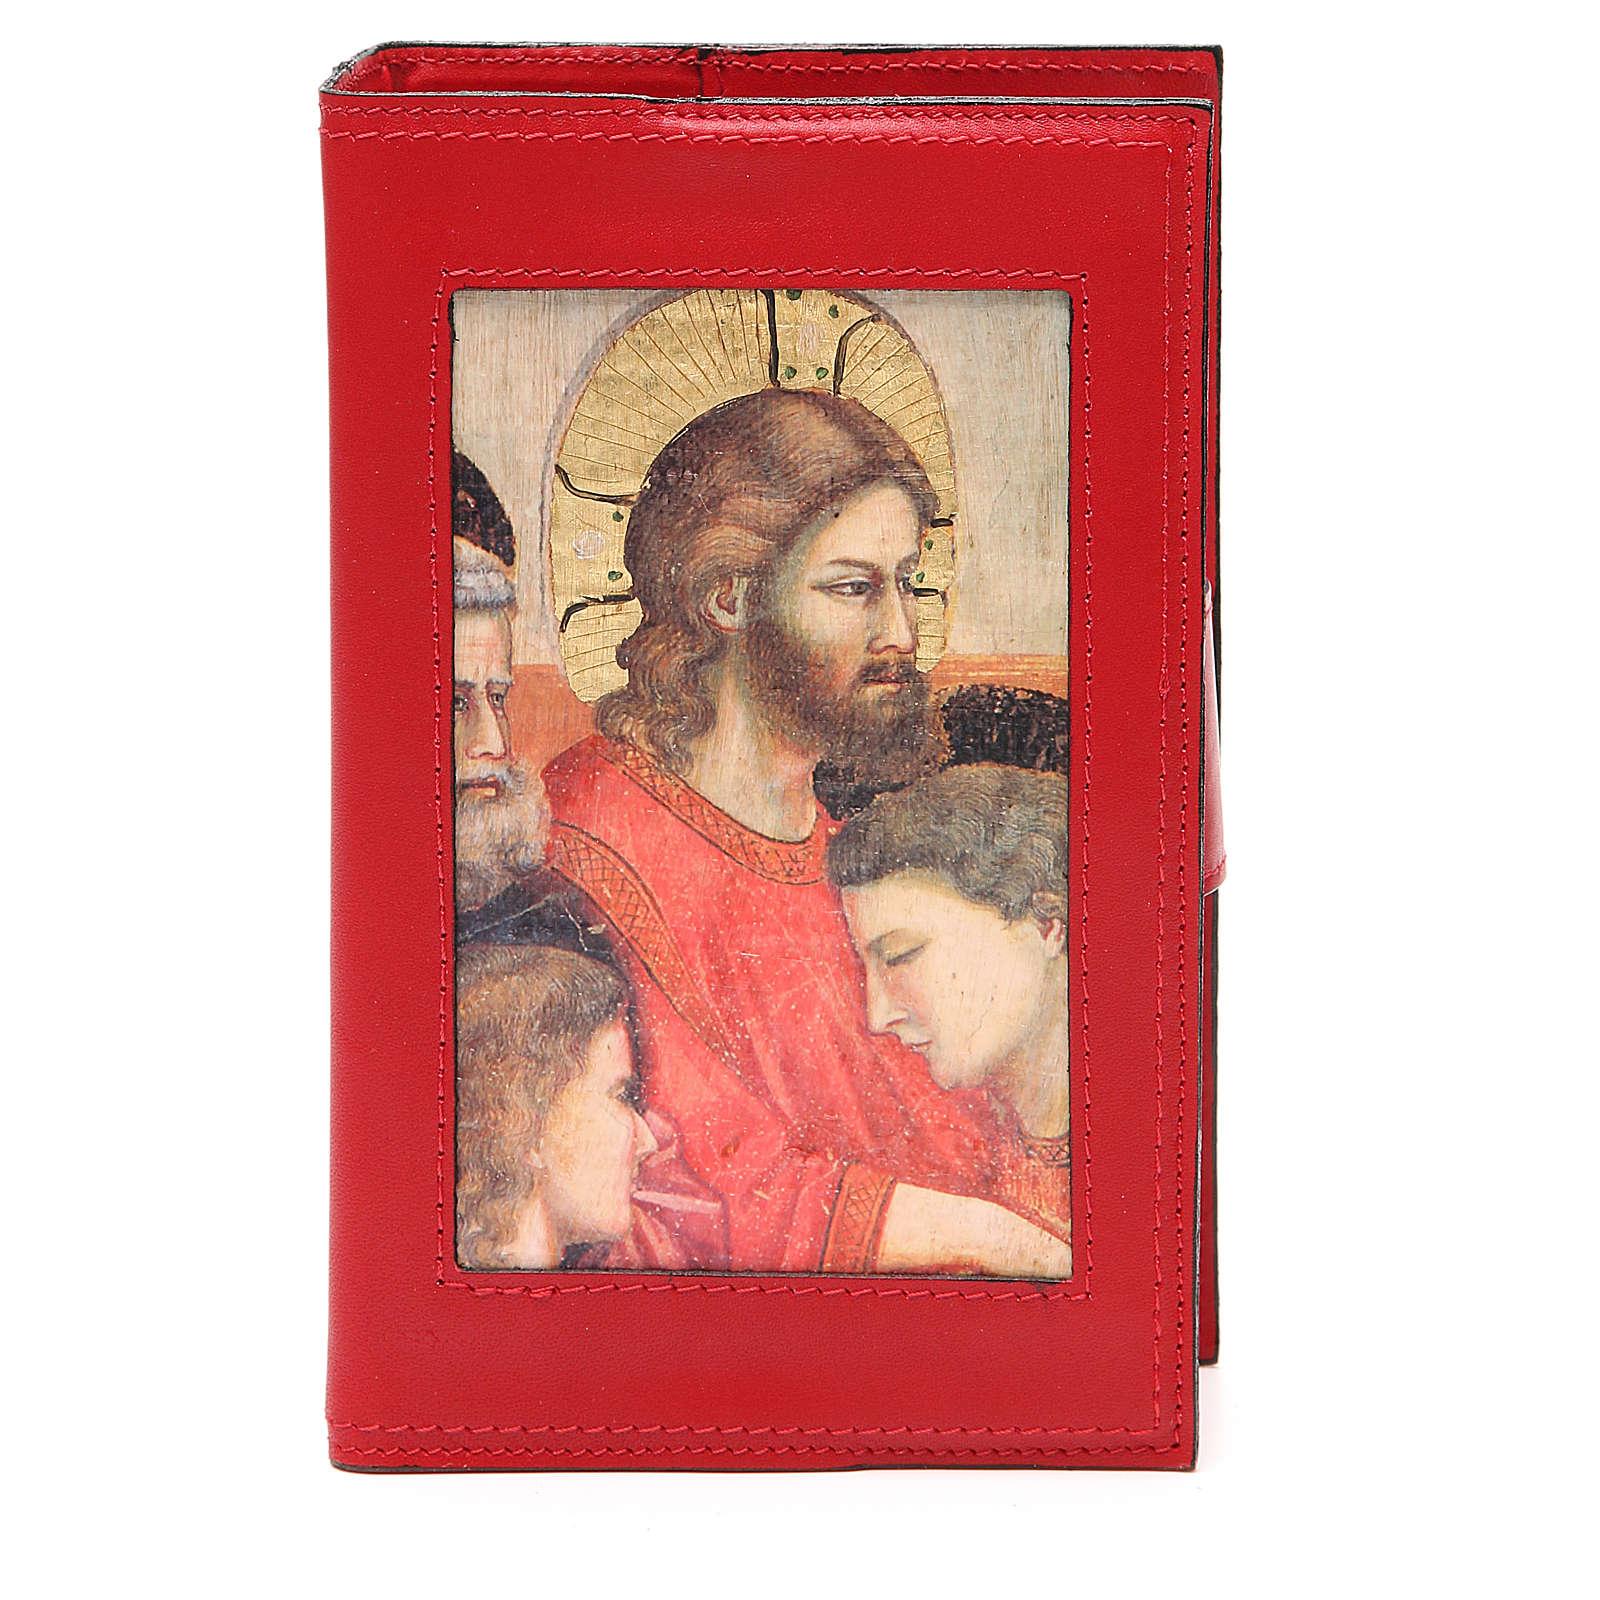 Couv. Lit. Heures 4 vol. cuir rouge Giotto Cène Pictographie 4